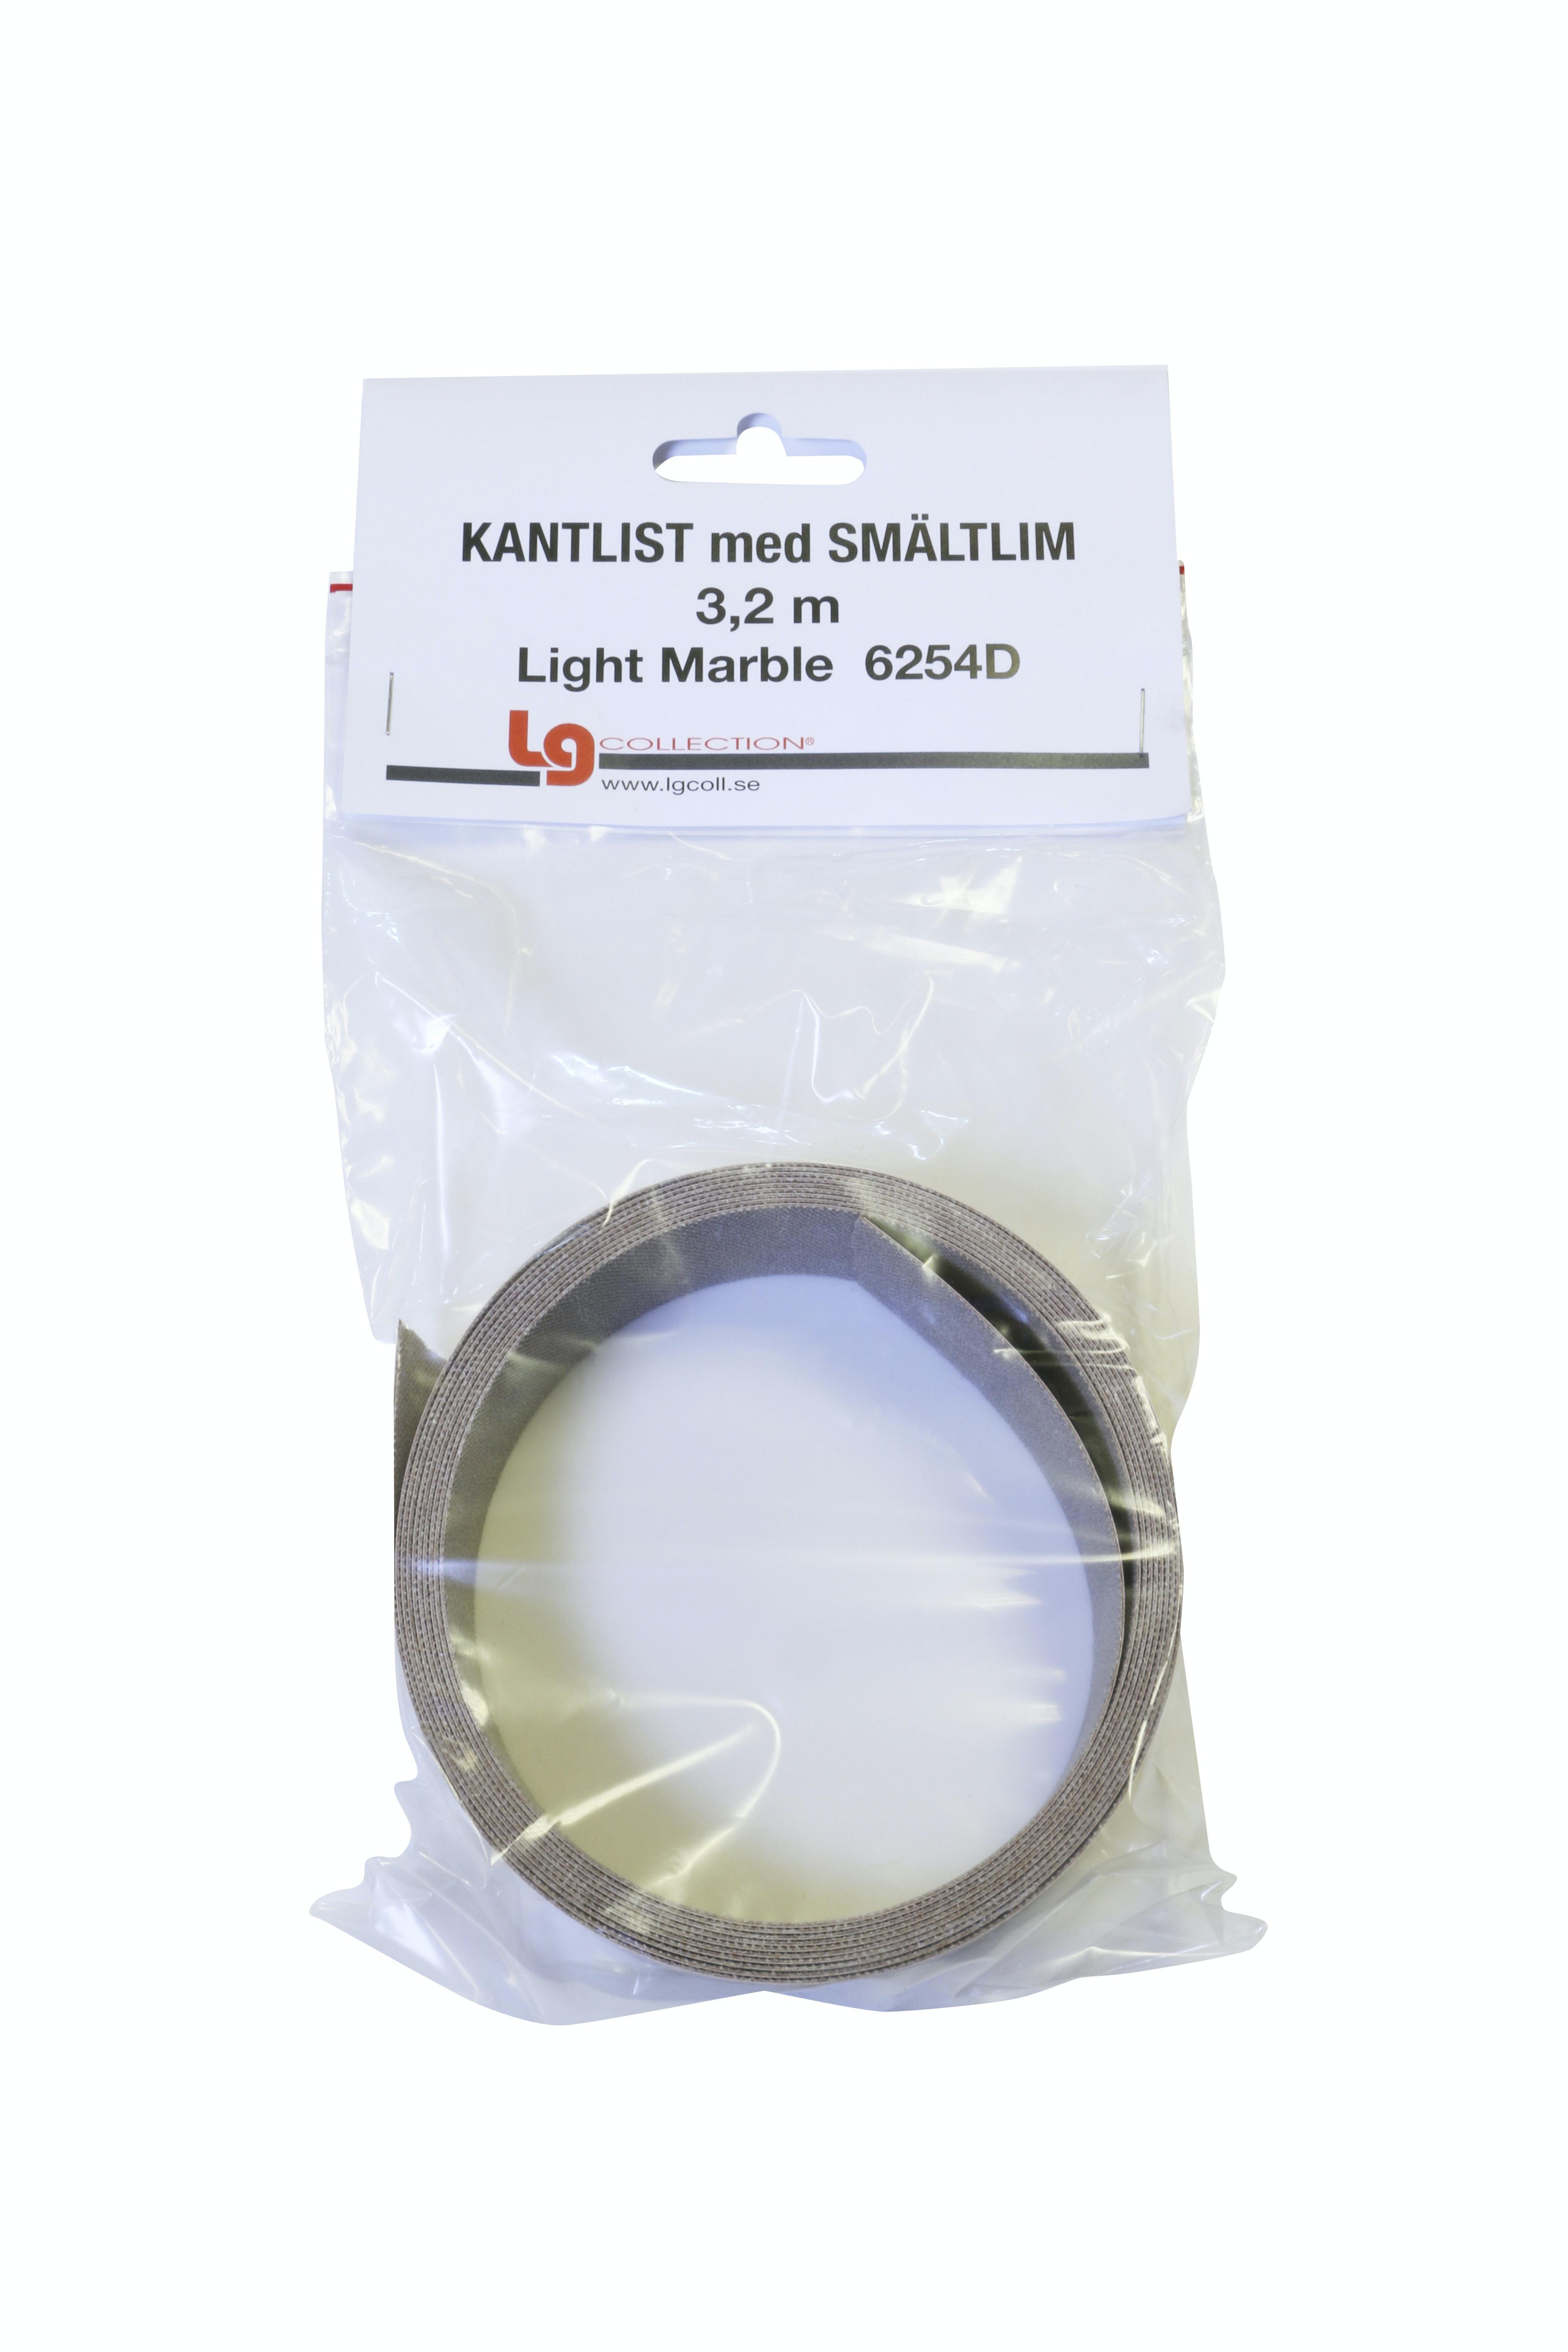 Kantband Sm 3,2m Ligth Marble Tc